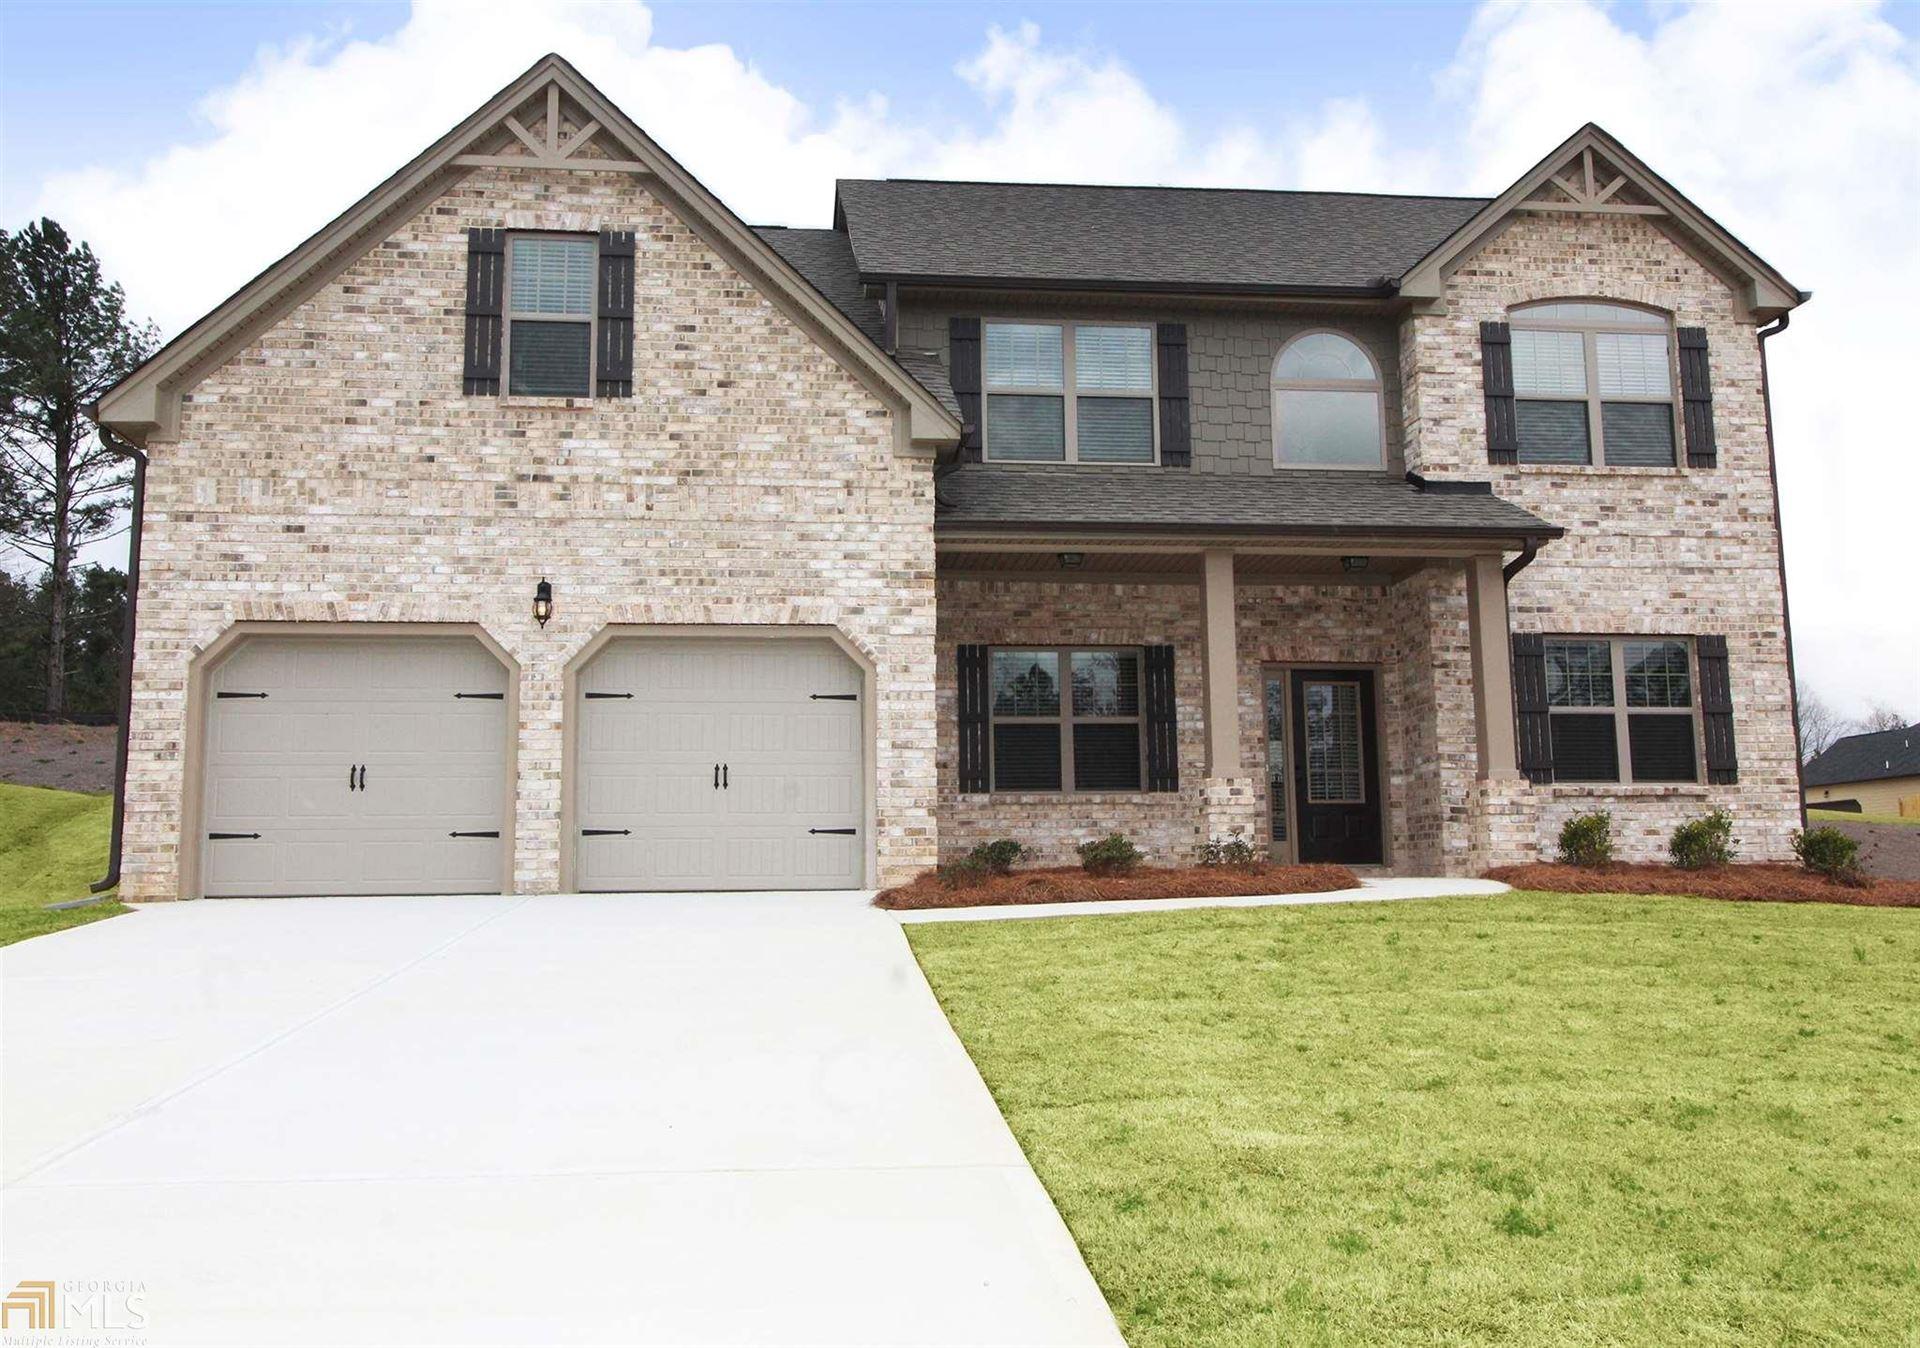 515 Rose Hill Ln, Lawrenceville, GA 30044 - MLS#: 8896744